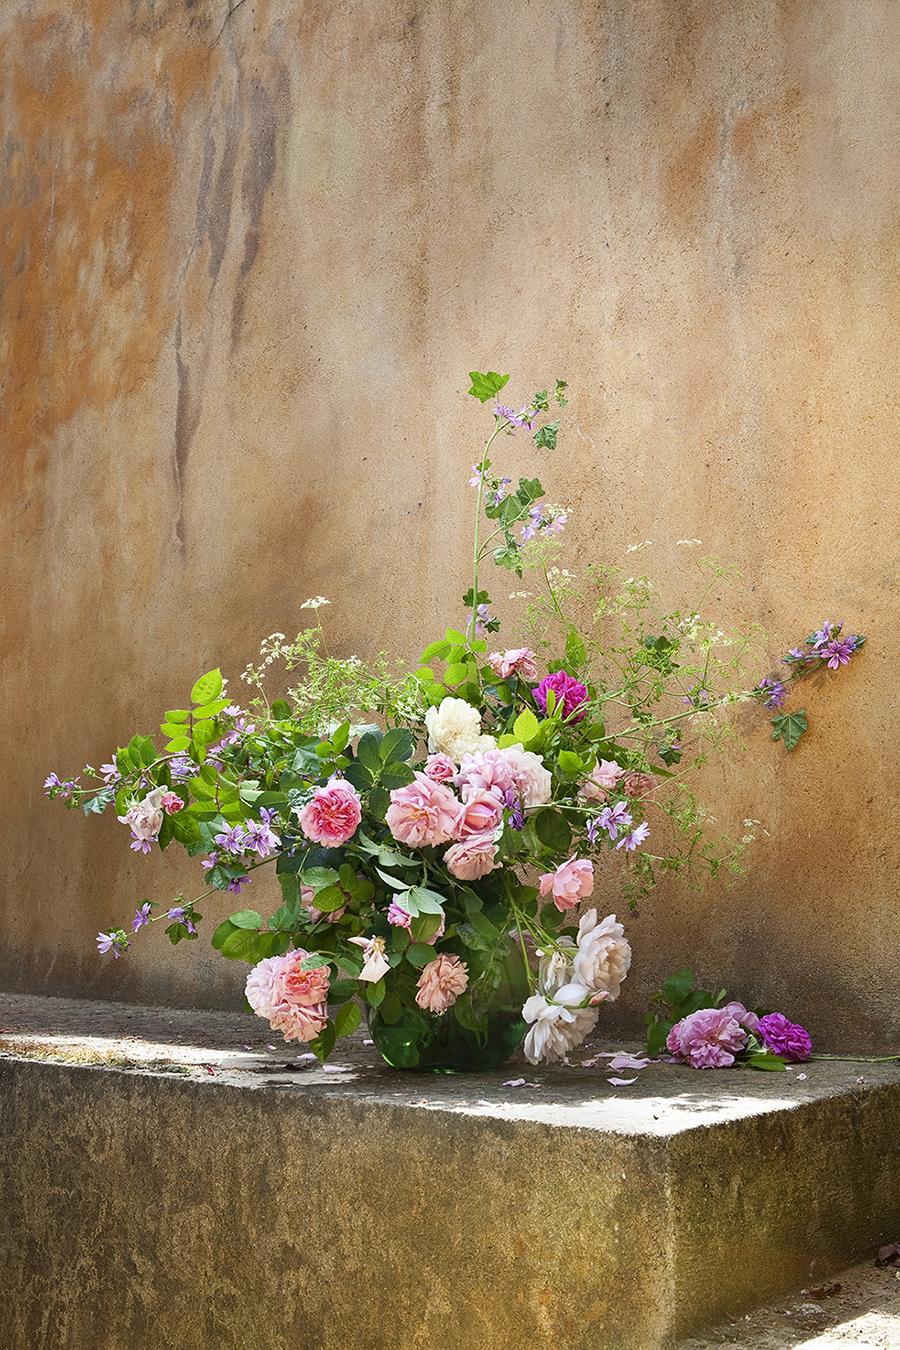 *** Local Caption *** Flores / arreglo floral / obra de InÈs Urquijo NUEVO ESTILO 460 01/07/2016 P6 P146